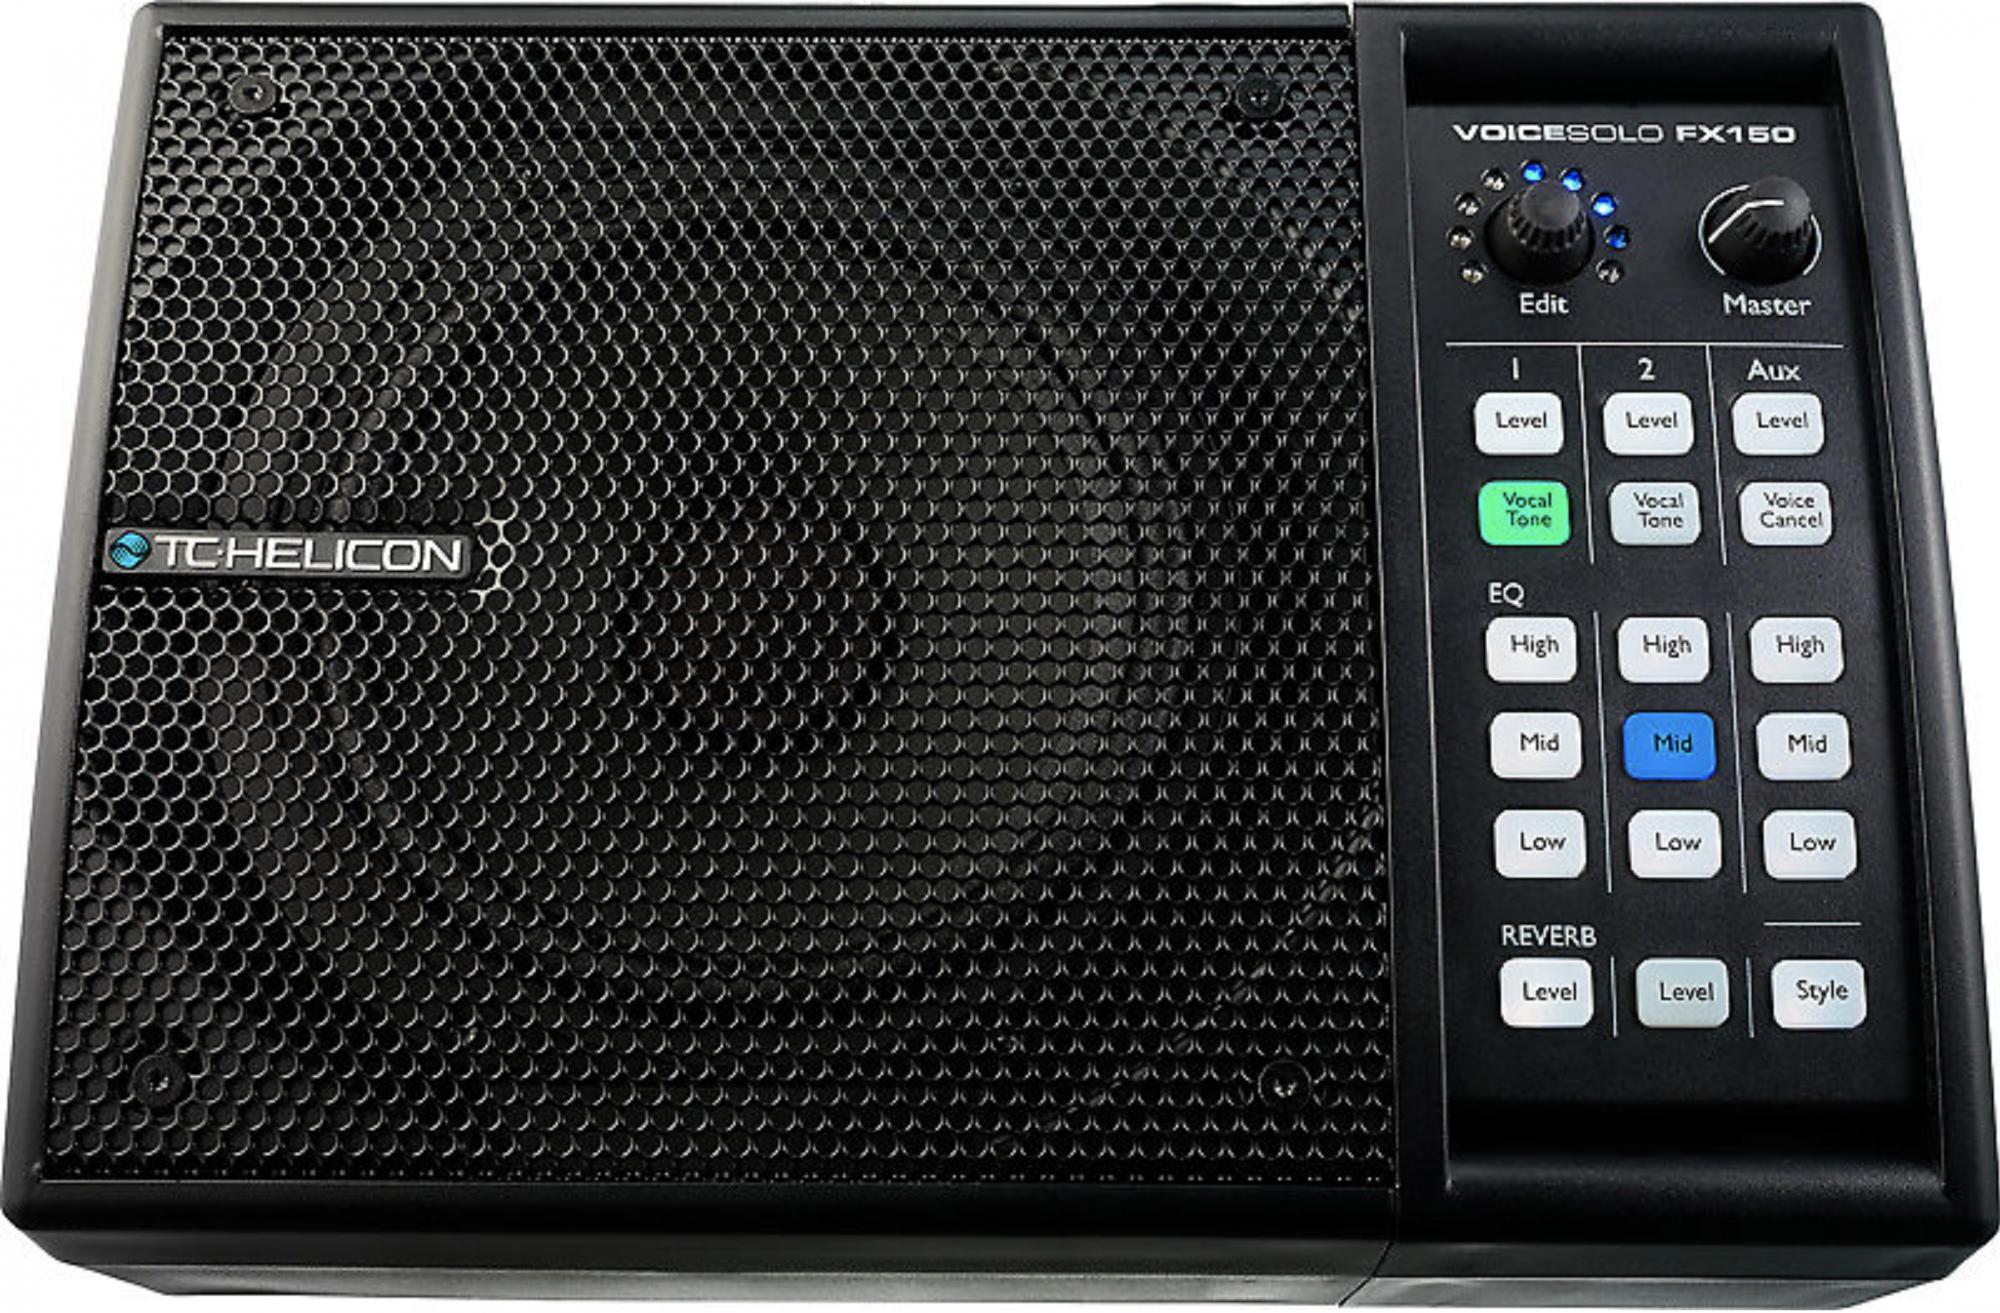 TC HELICON VOICESOLO FX150 VOCAL MONITOR 150W 3. CHANNEL W/REVERB (996551011)